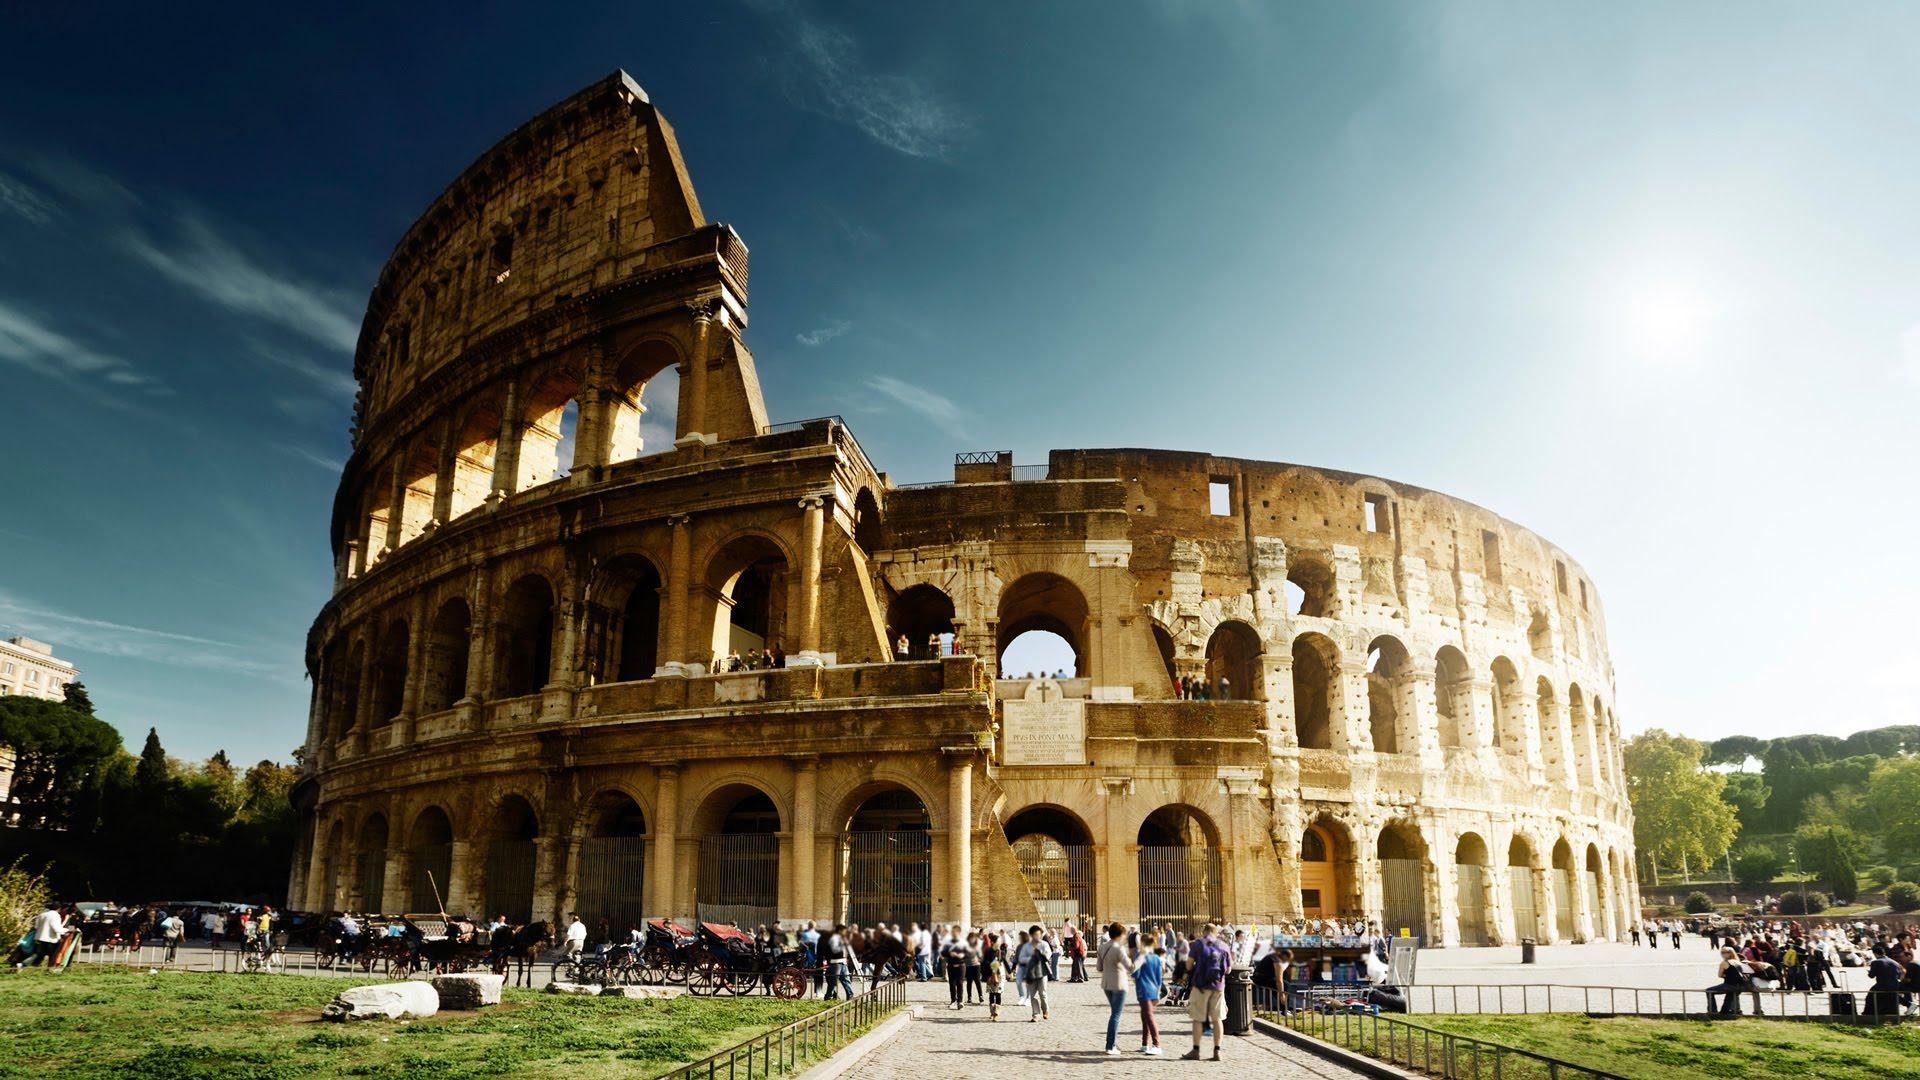 「走吧!一起探索羅馬之美」- Rome Italy Top Things to Do